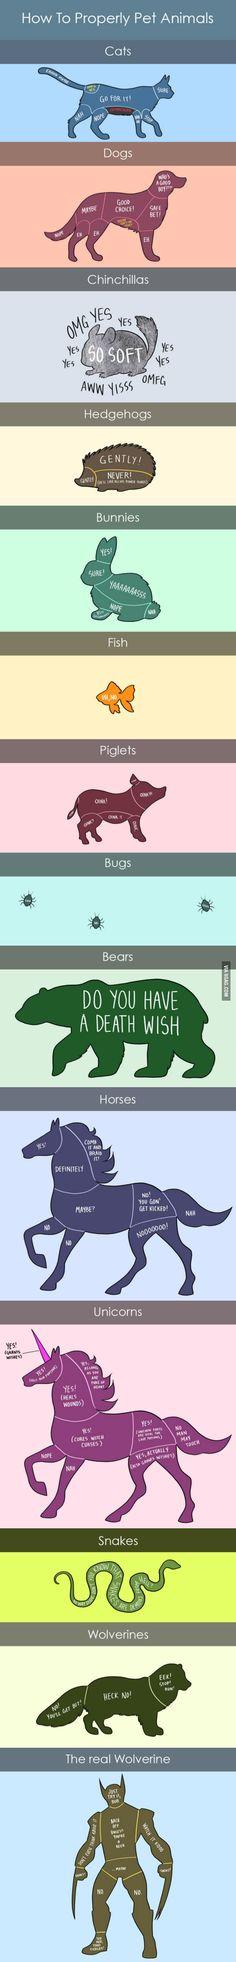 How to pet animals... (by Adam Ellis) - 9GAG